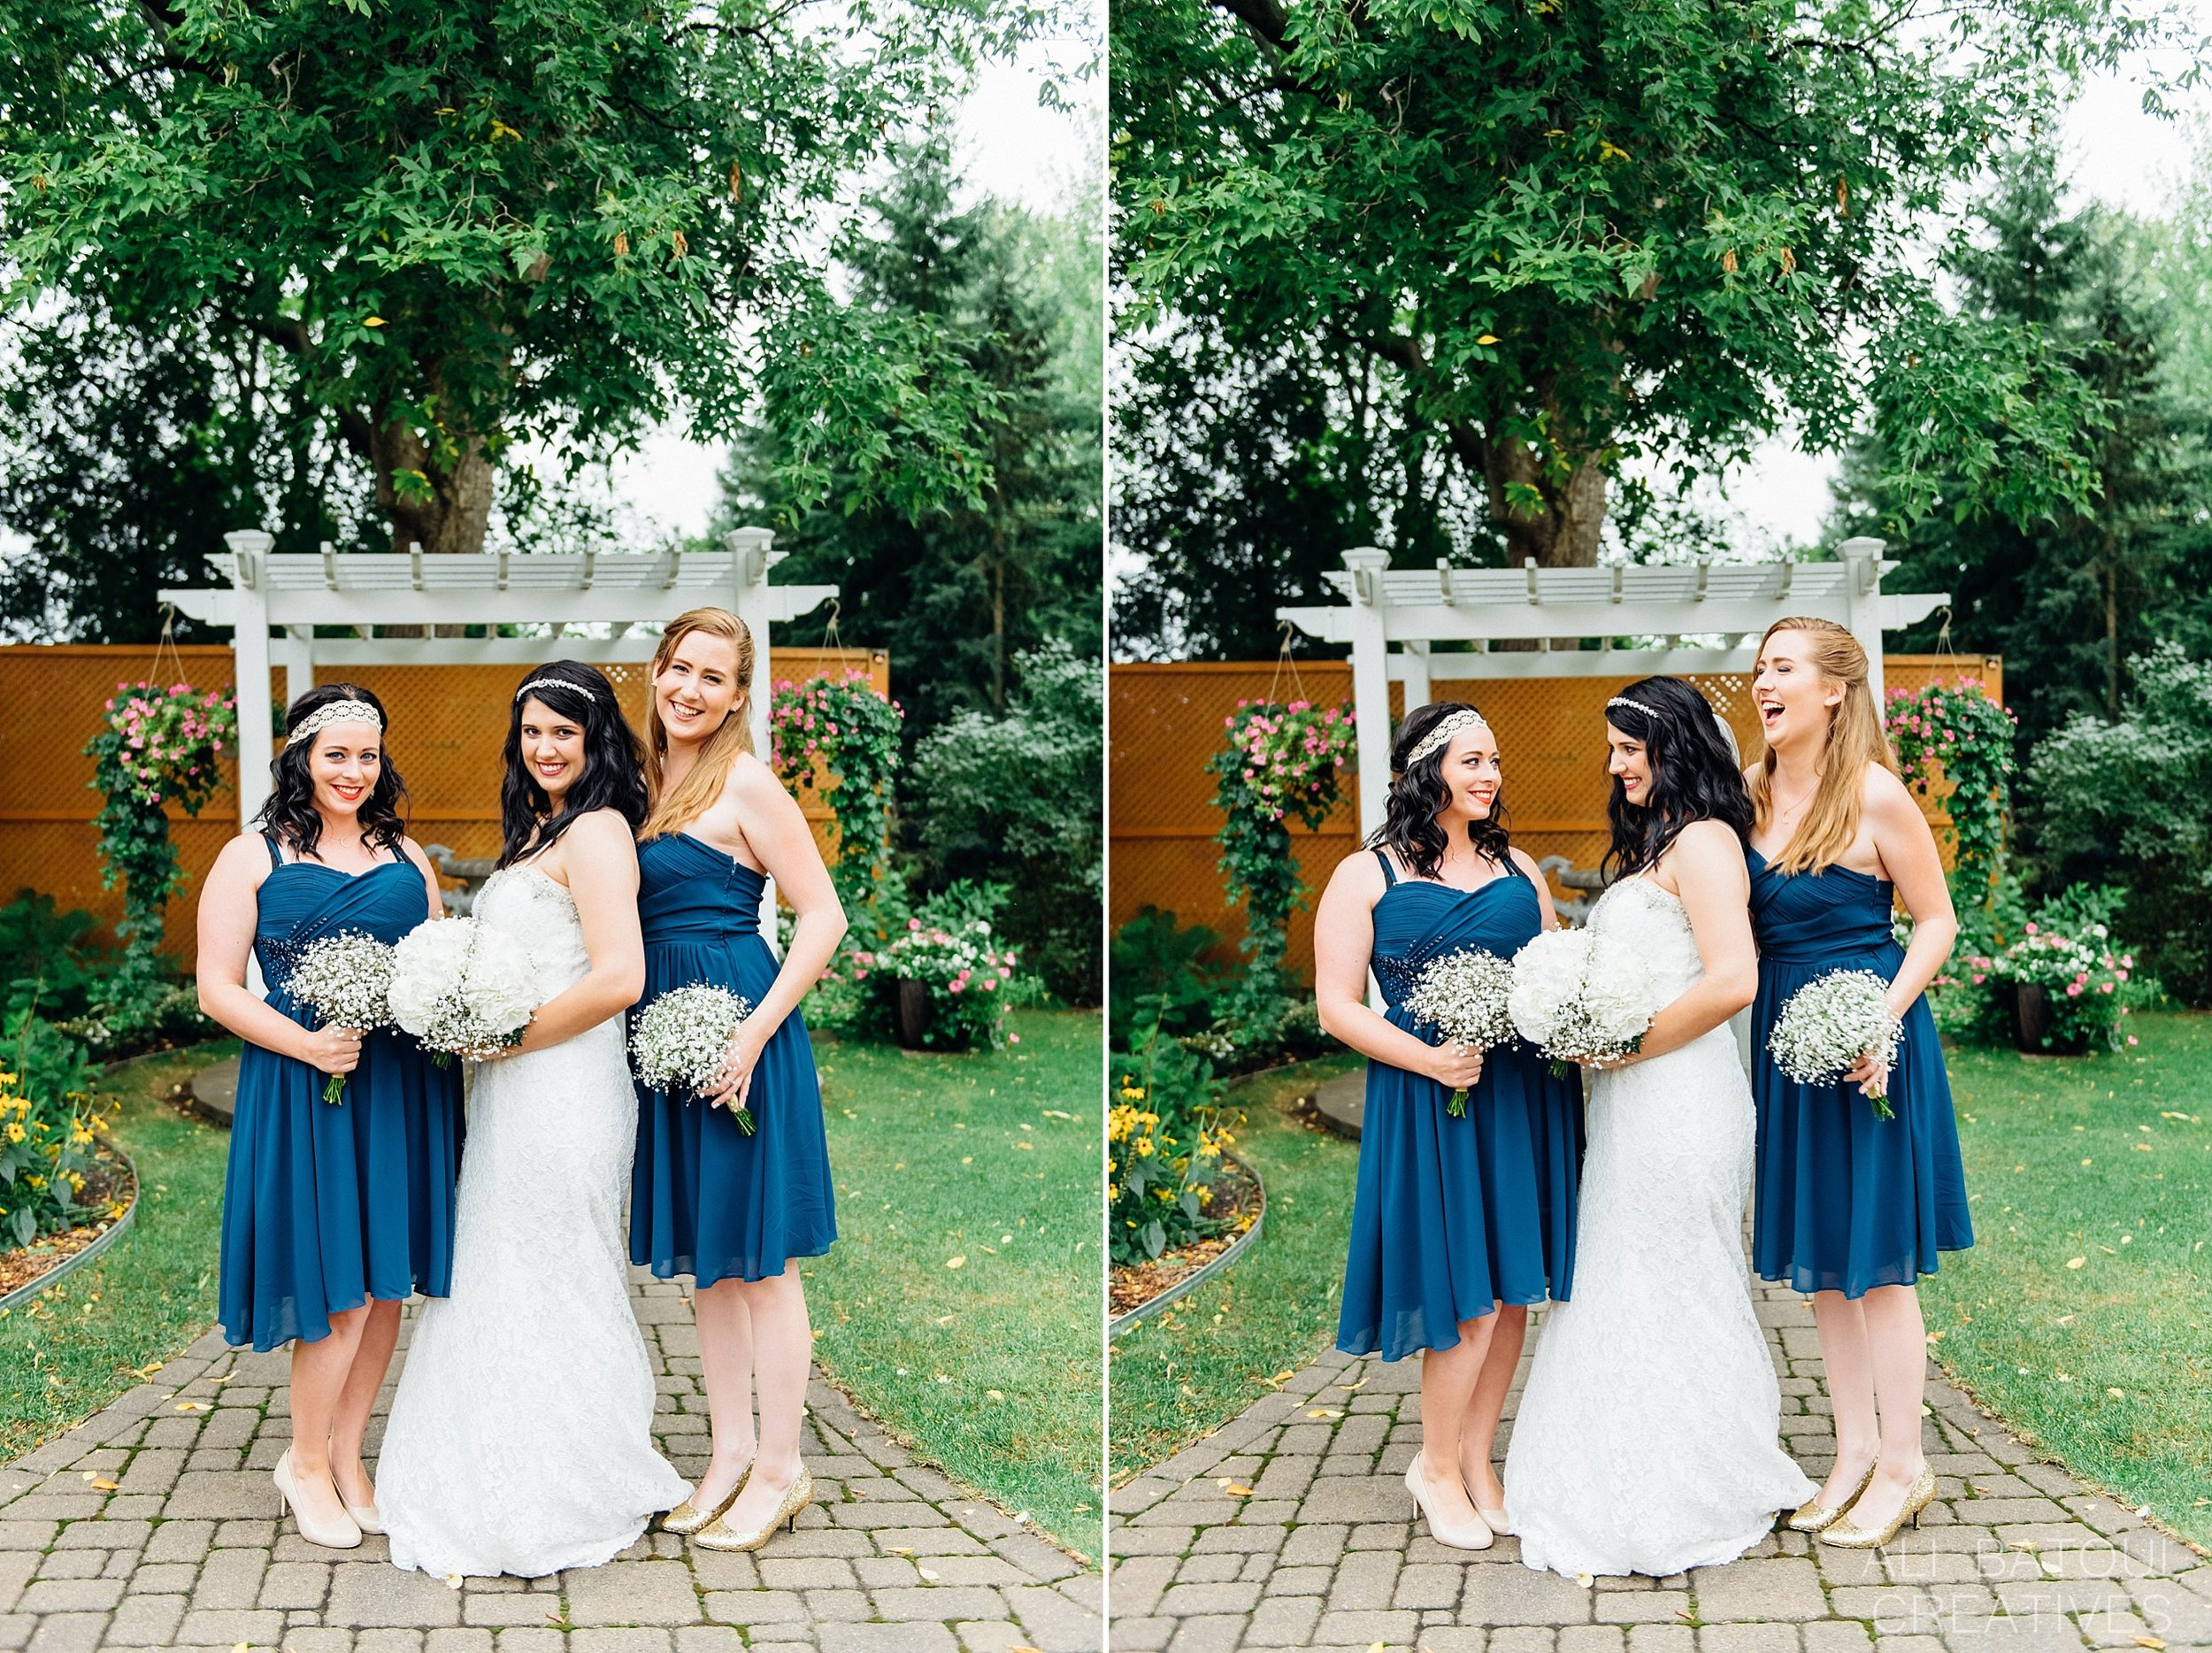 Jocelyn + Steve At The Schoolhouse Wedding - Ali and Batoul Fine Art Wedding Photography_0058.jpg